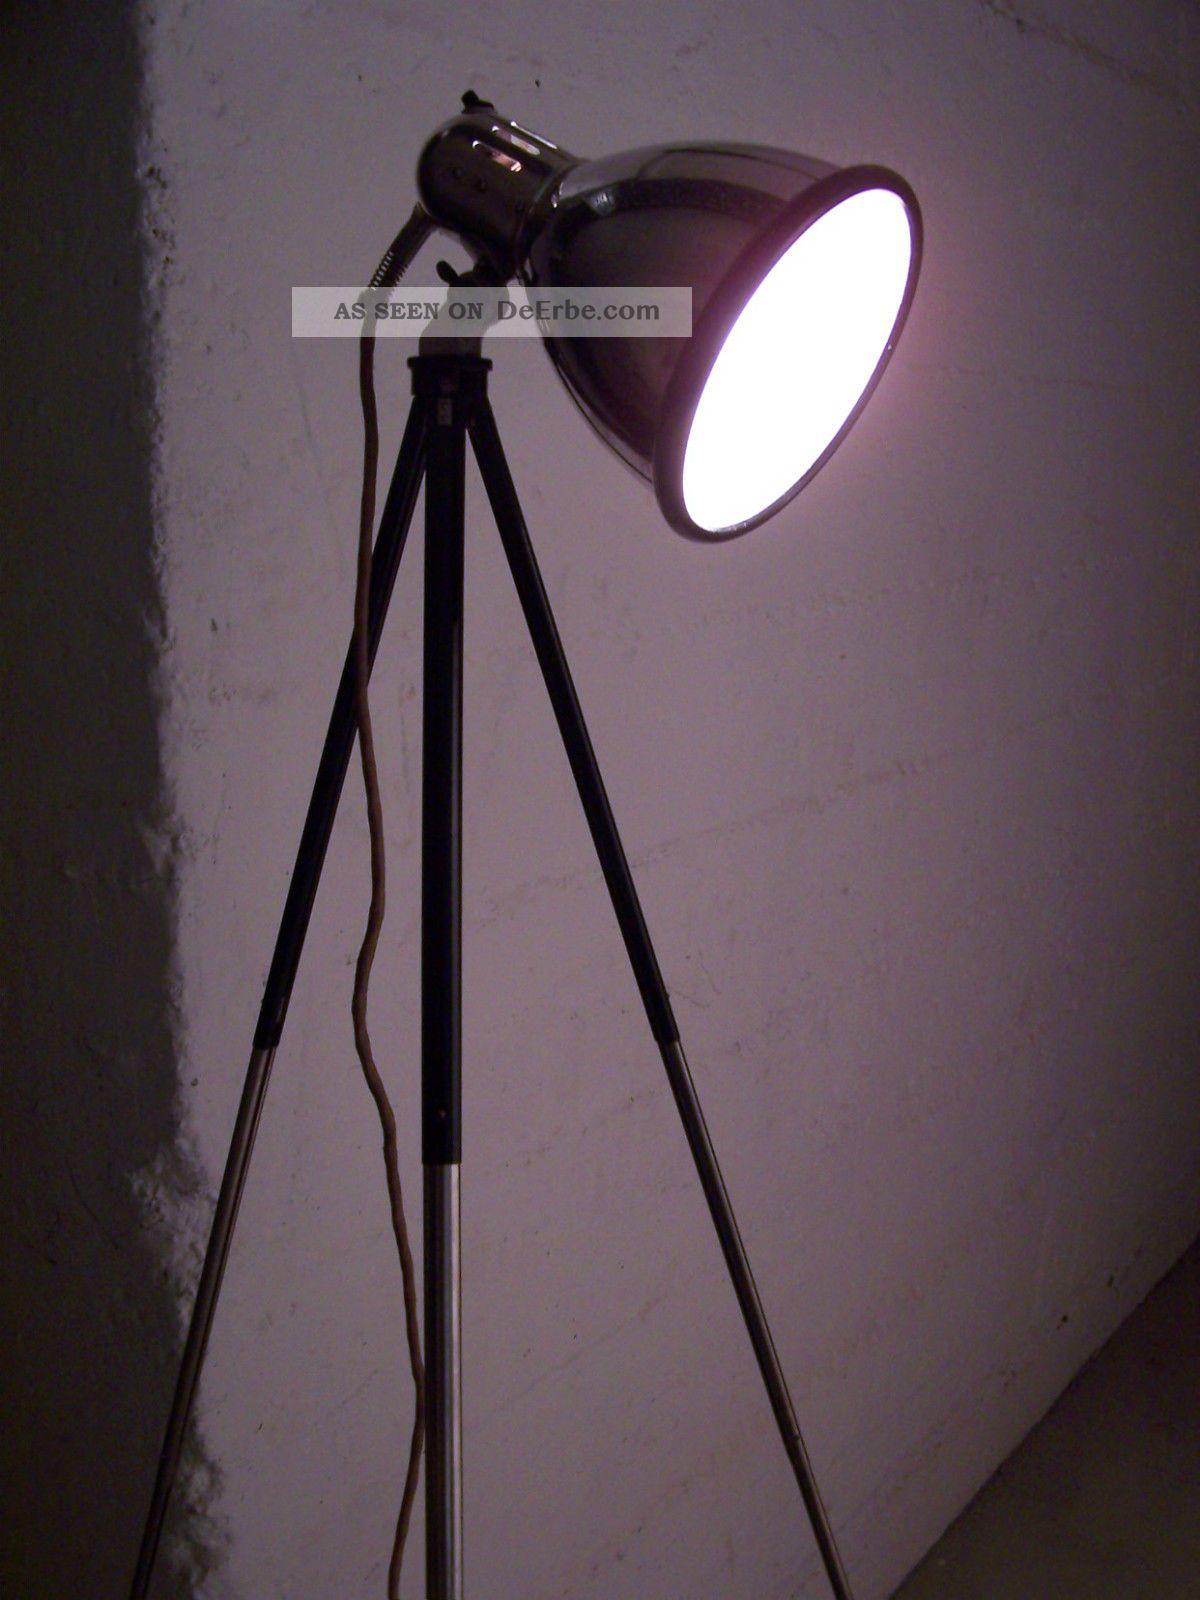 bauhaus stehlampe tripod lampe art deco chrom strahler. Black Bedroom Furniture Sets. Home Design Ideas